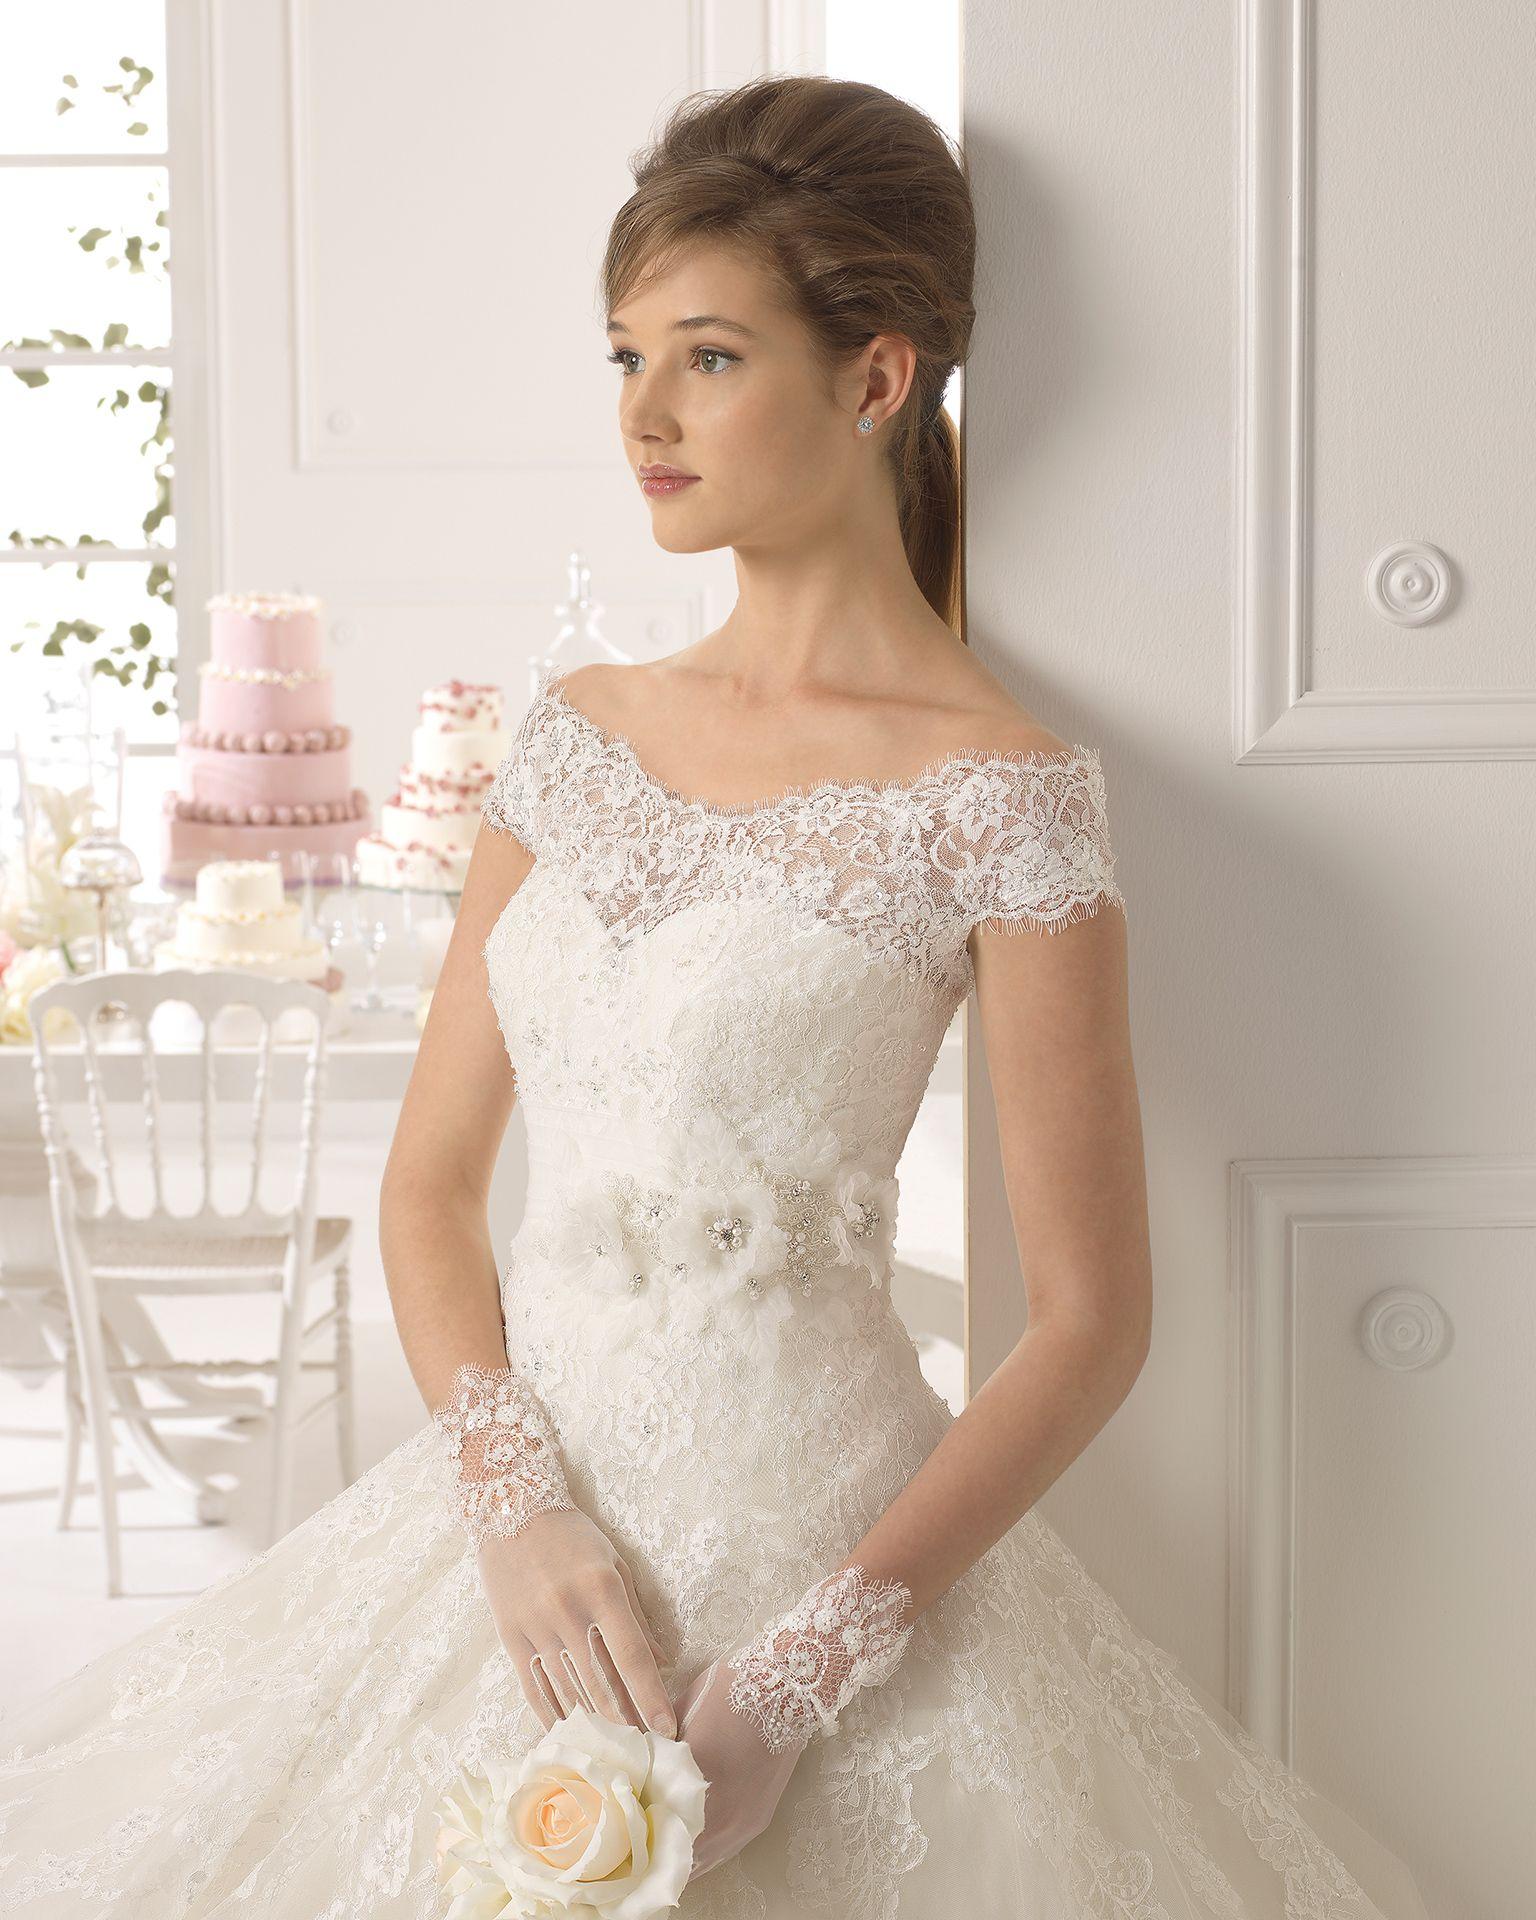 Ayamonte vestido de novia tejido encaje, pedreria y tul | Wedding ...